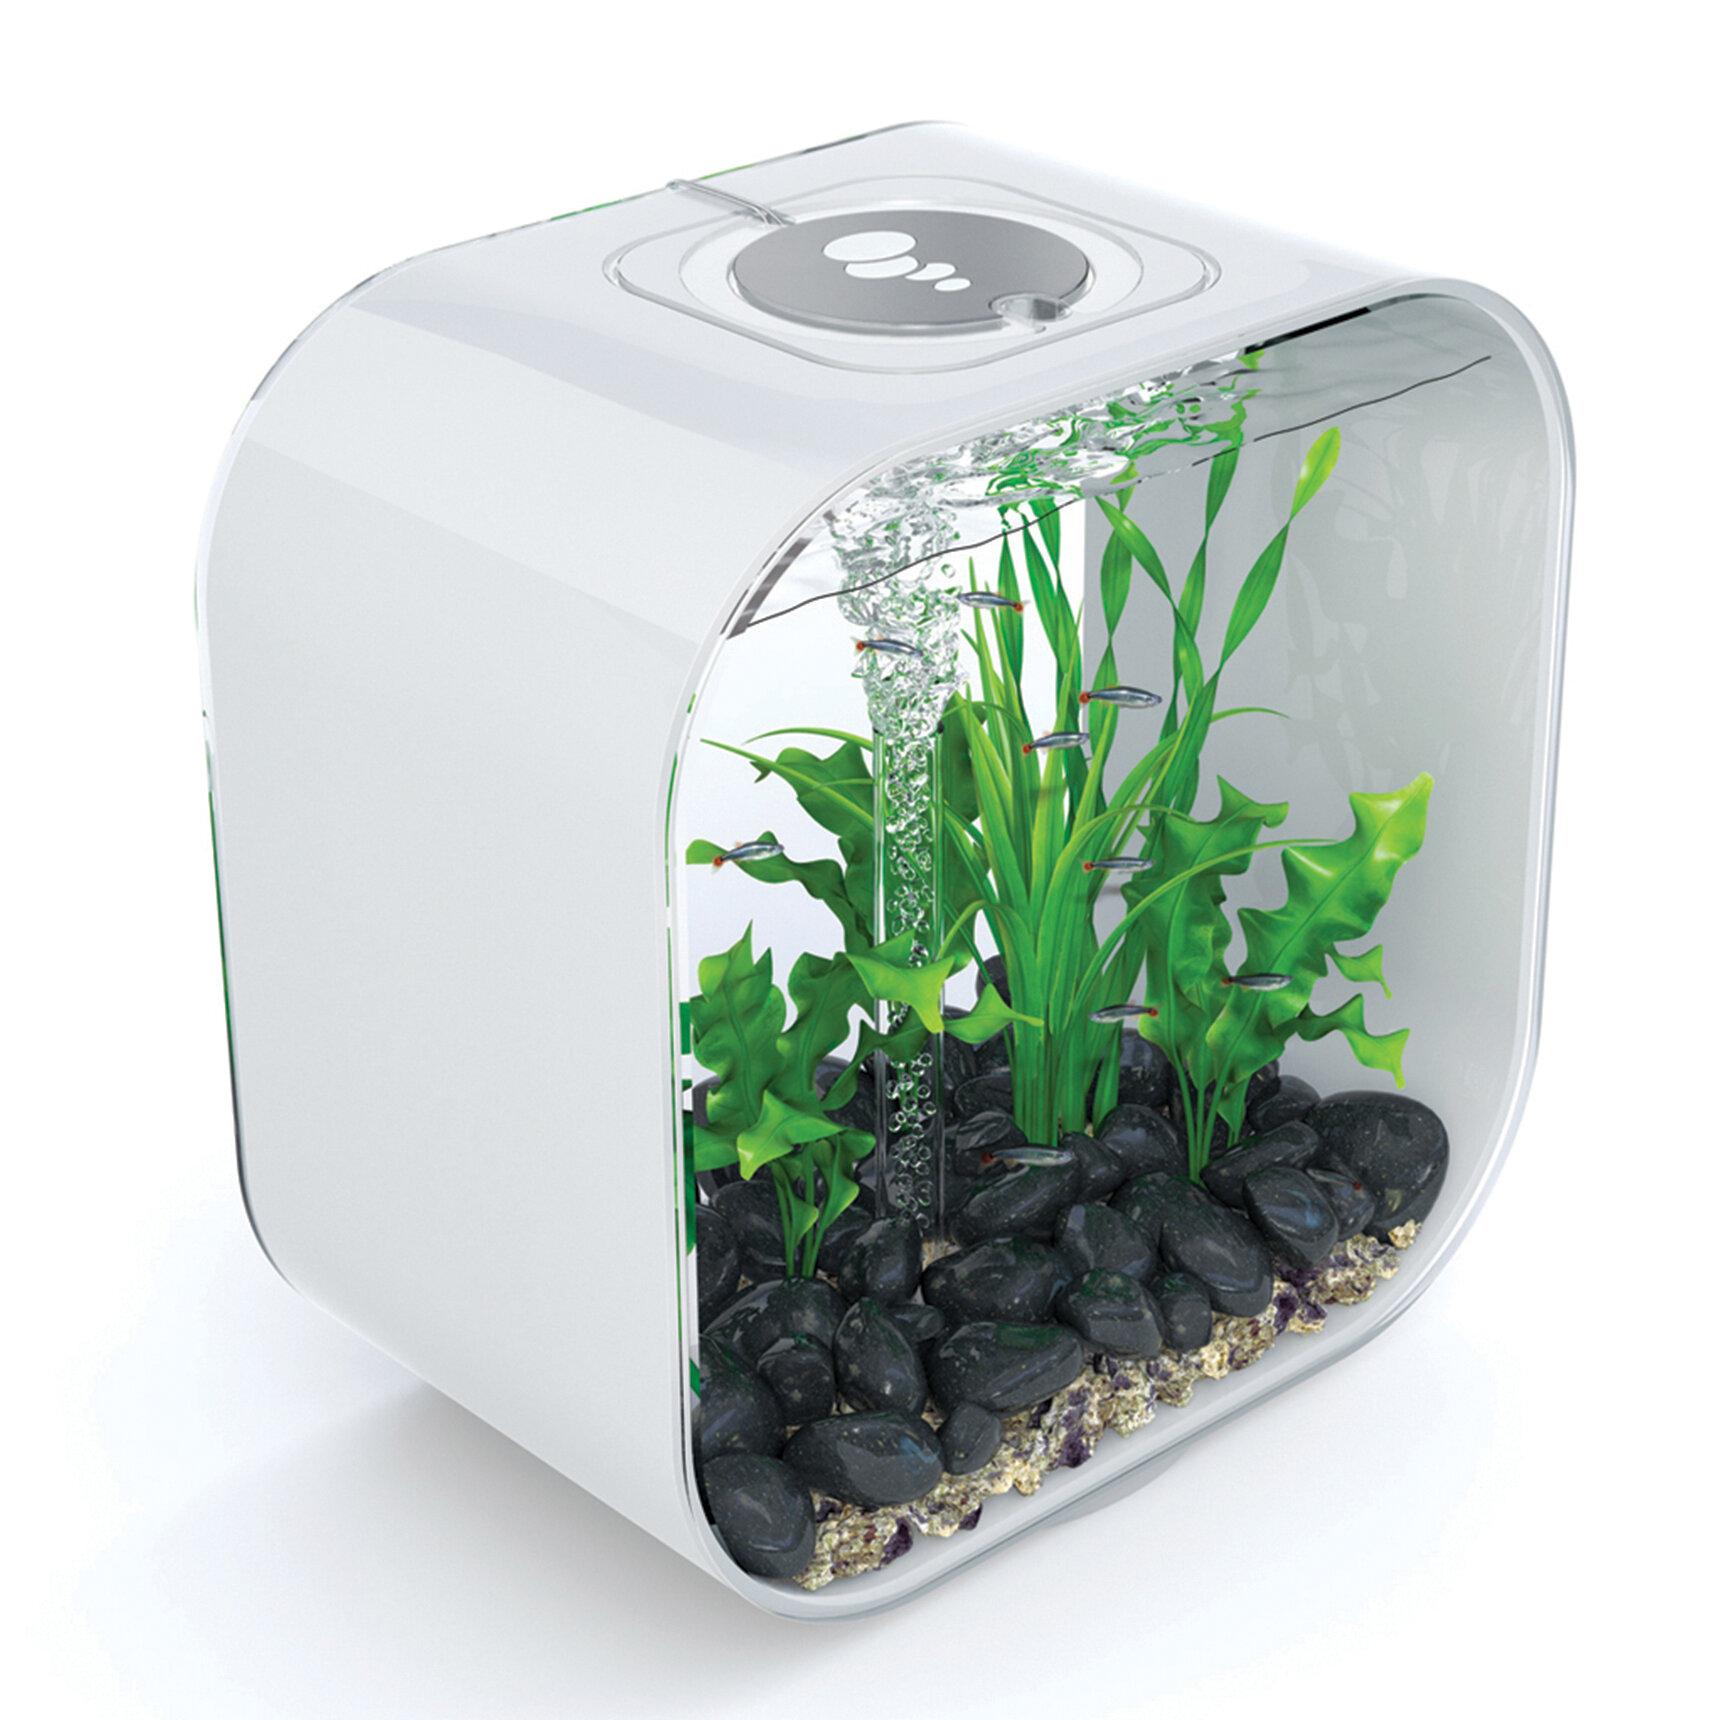 biOrb 8 Gallon Life Aquarium Tank | Wayfair